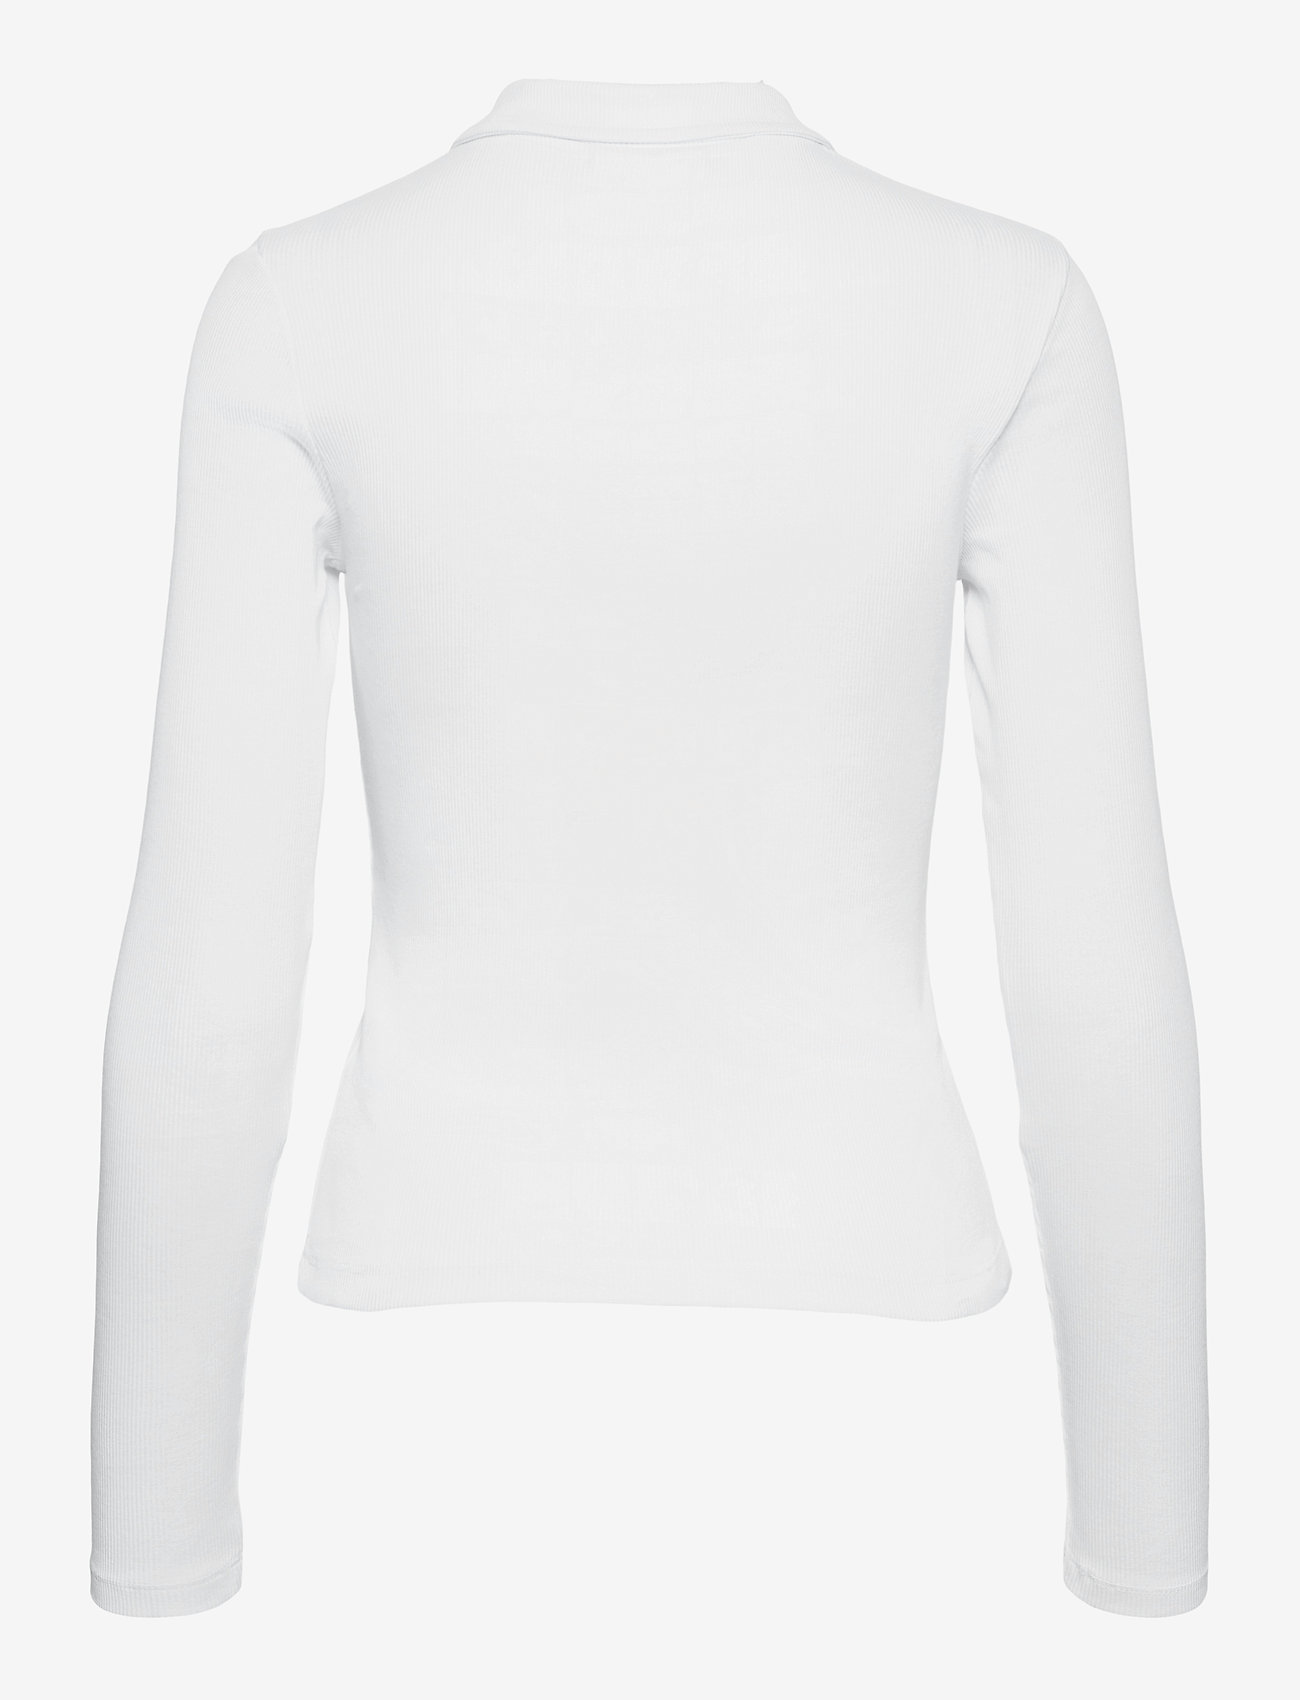 Gina Tricot - Bea top - polohemden - white (1000) - 1